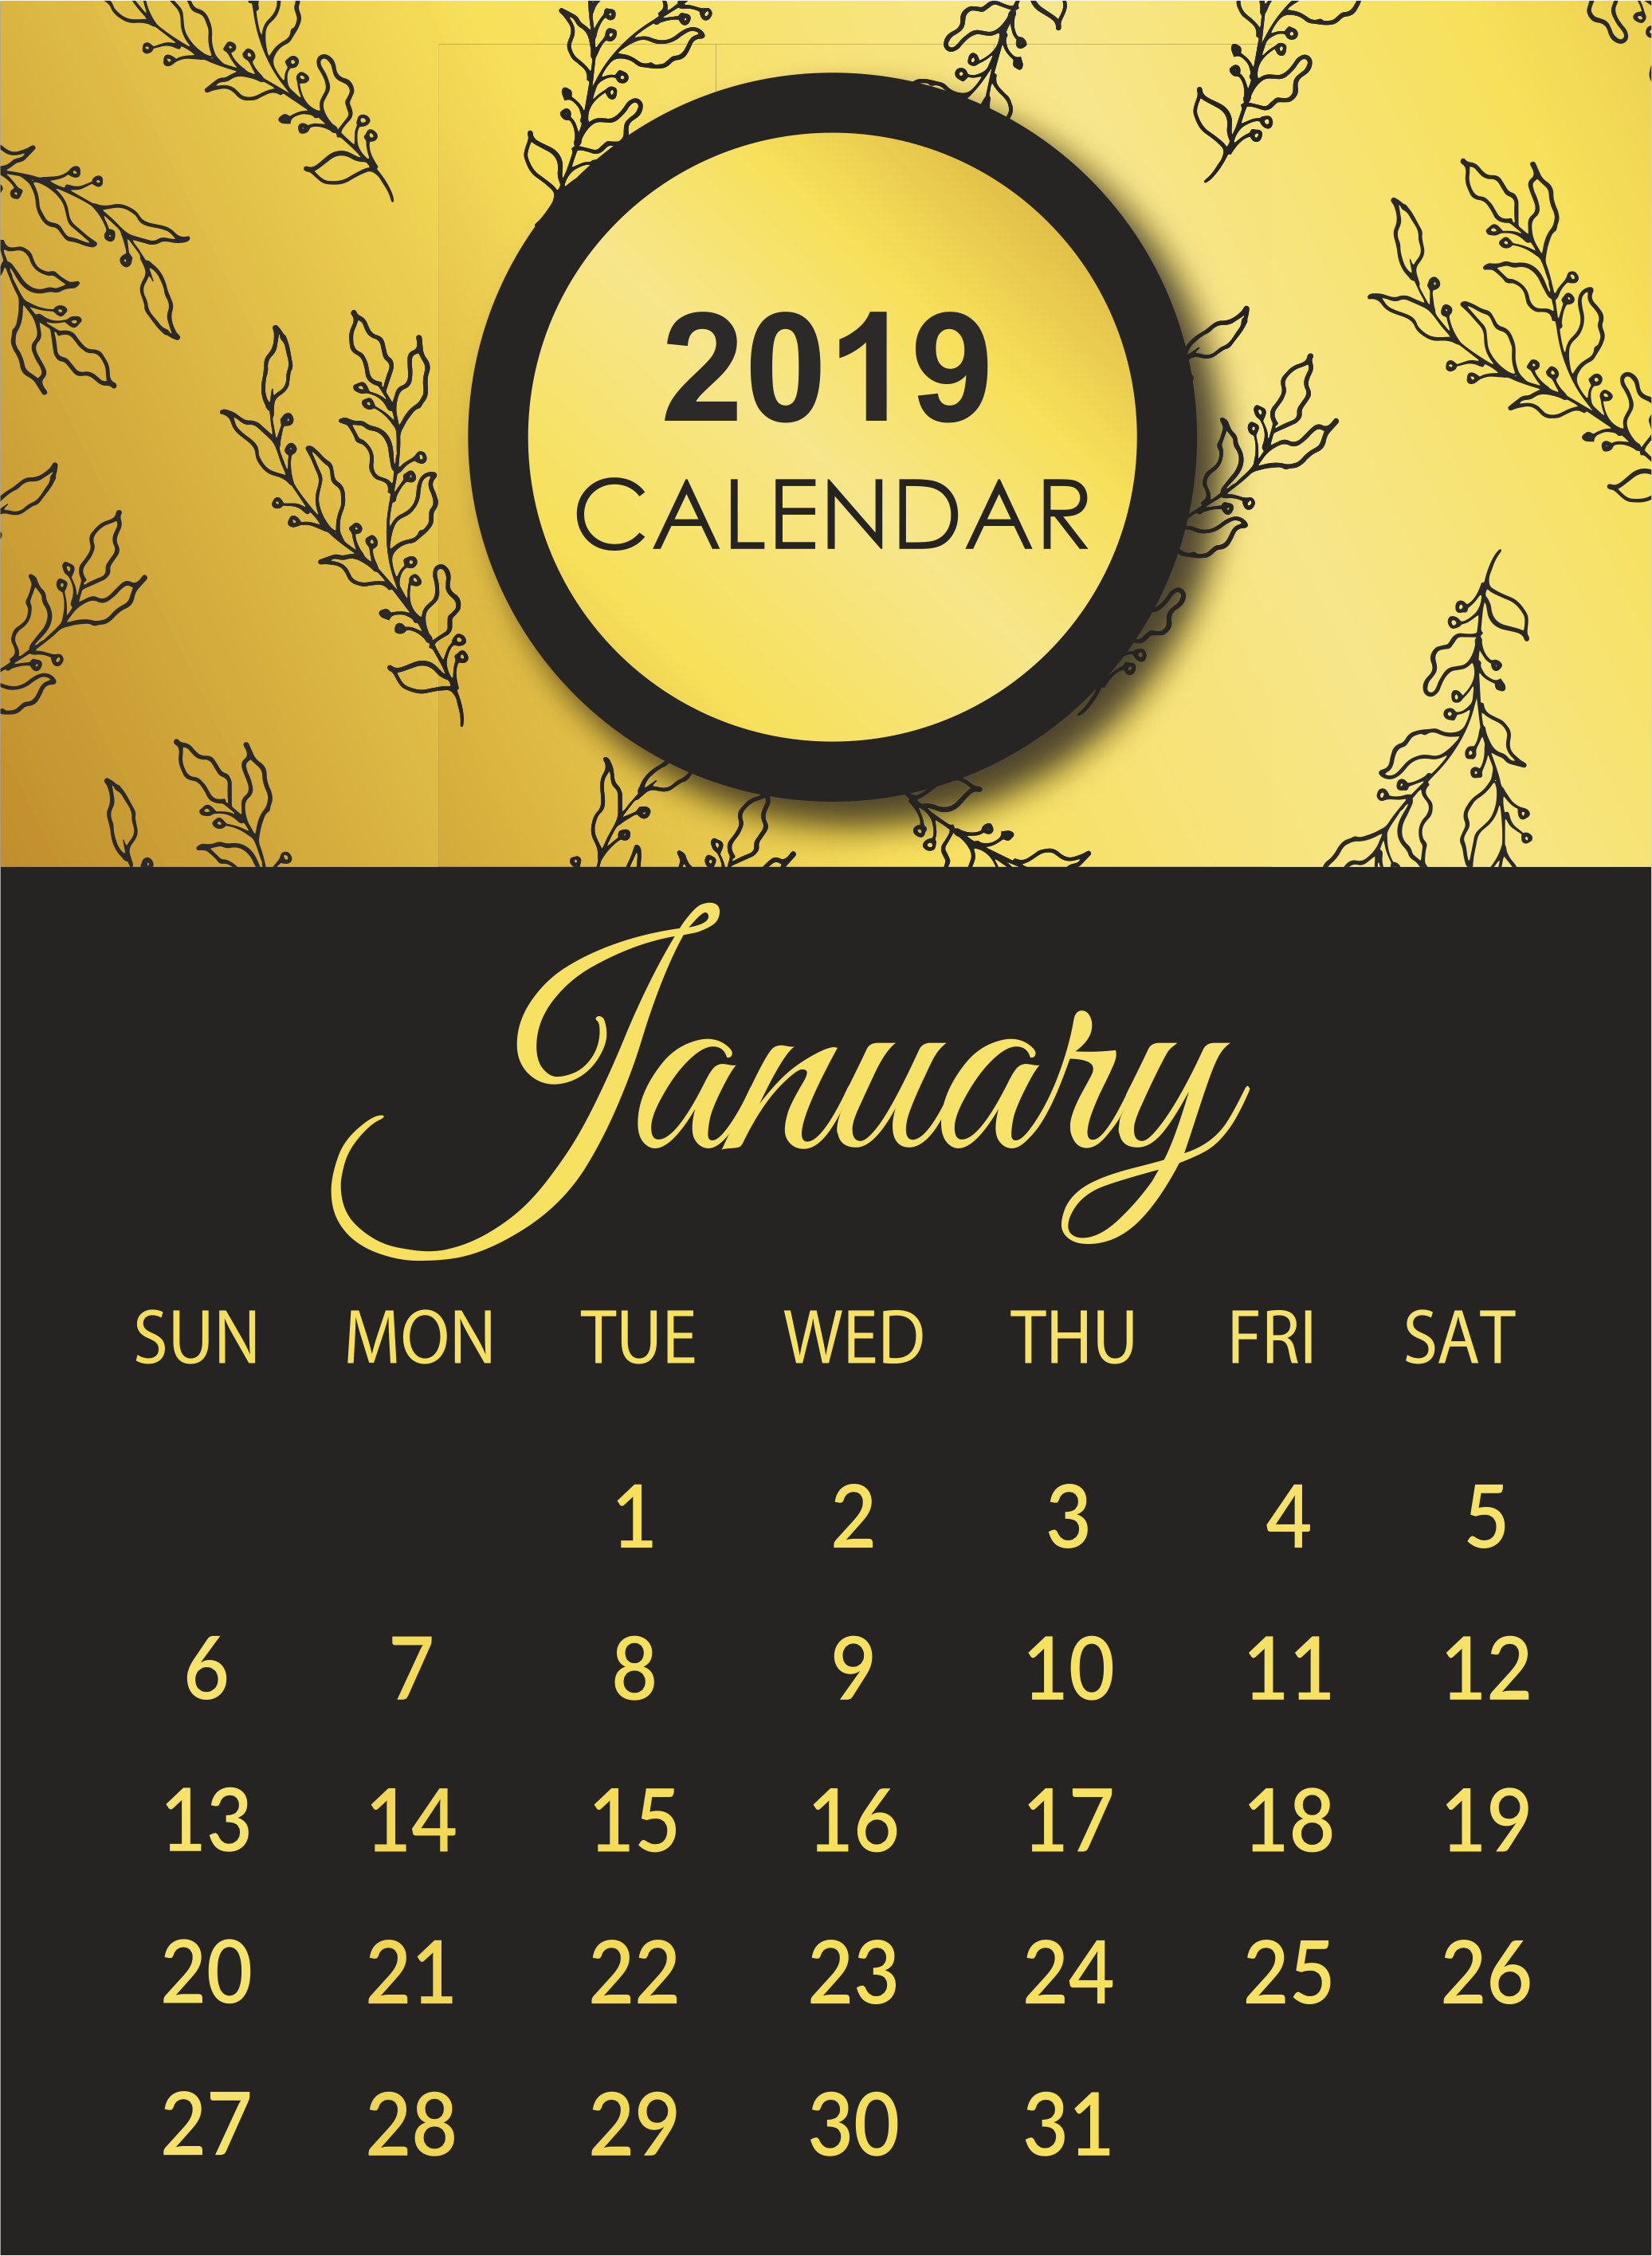 Calendar January 2019 Printable For Bills Print January 2019 Calendar Image #january #january2019